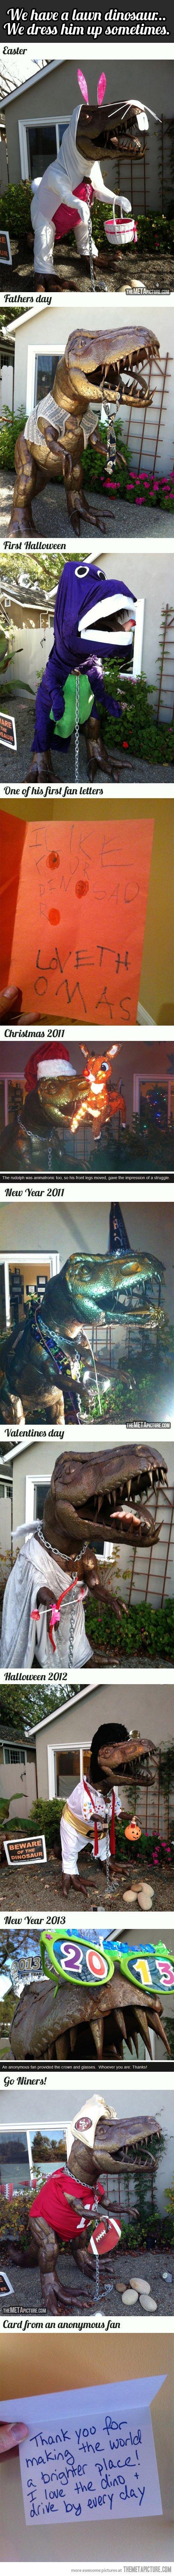 Lawn Dinosaur. . Behaved lawn dinsaur... We drew him . New 'Year era. Where does one acquire a lawn dinosaur? Lawn Dinosaur Behaved lawn dinsaur We drew him New 'Year era Where does one acquire a dinosaur?